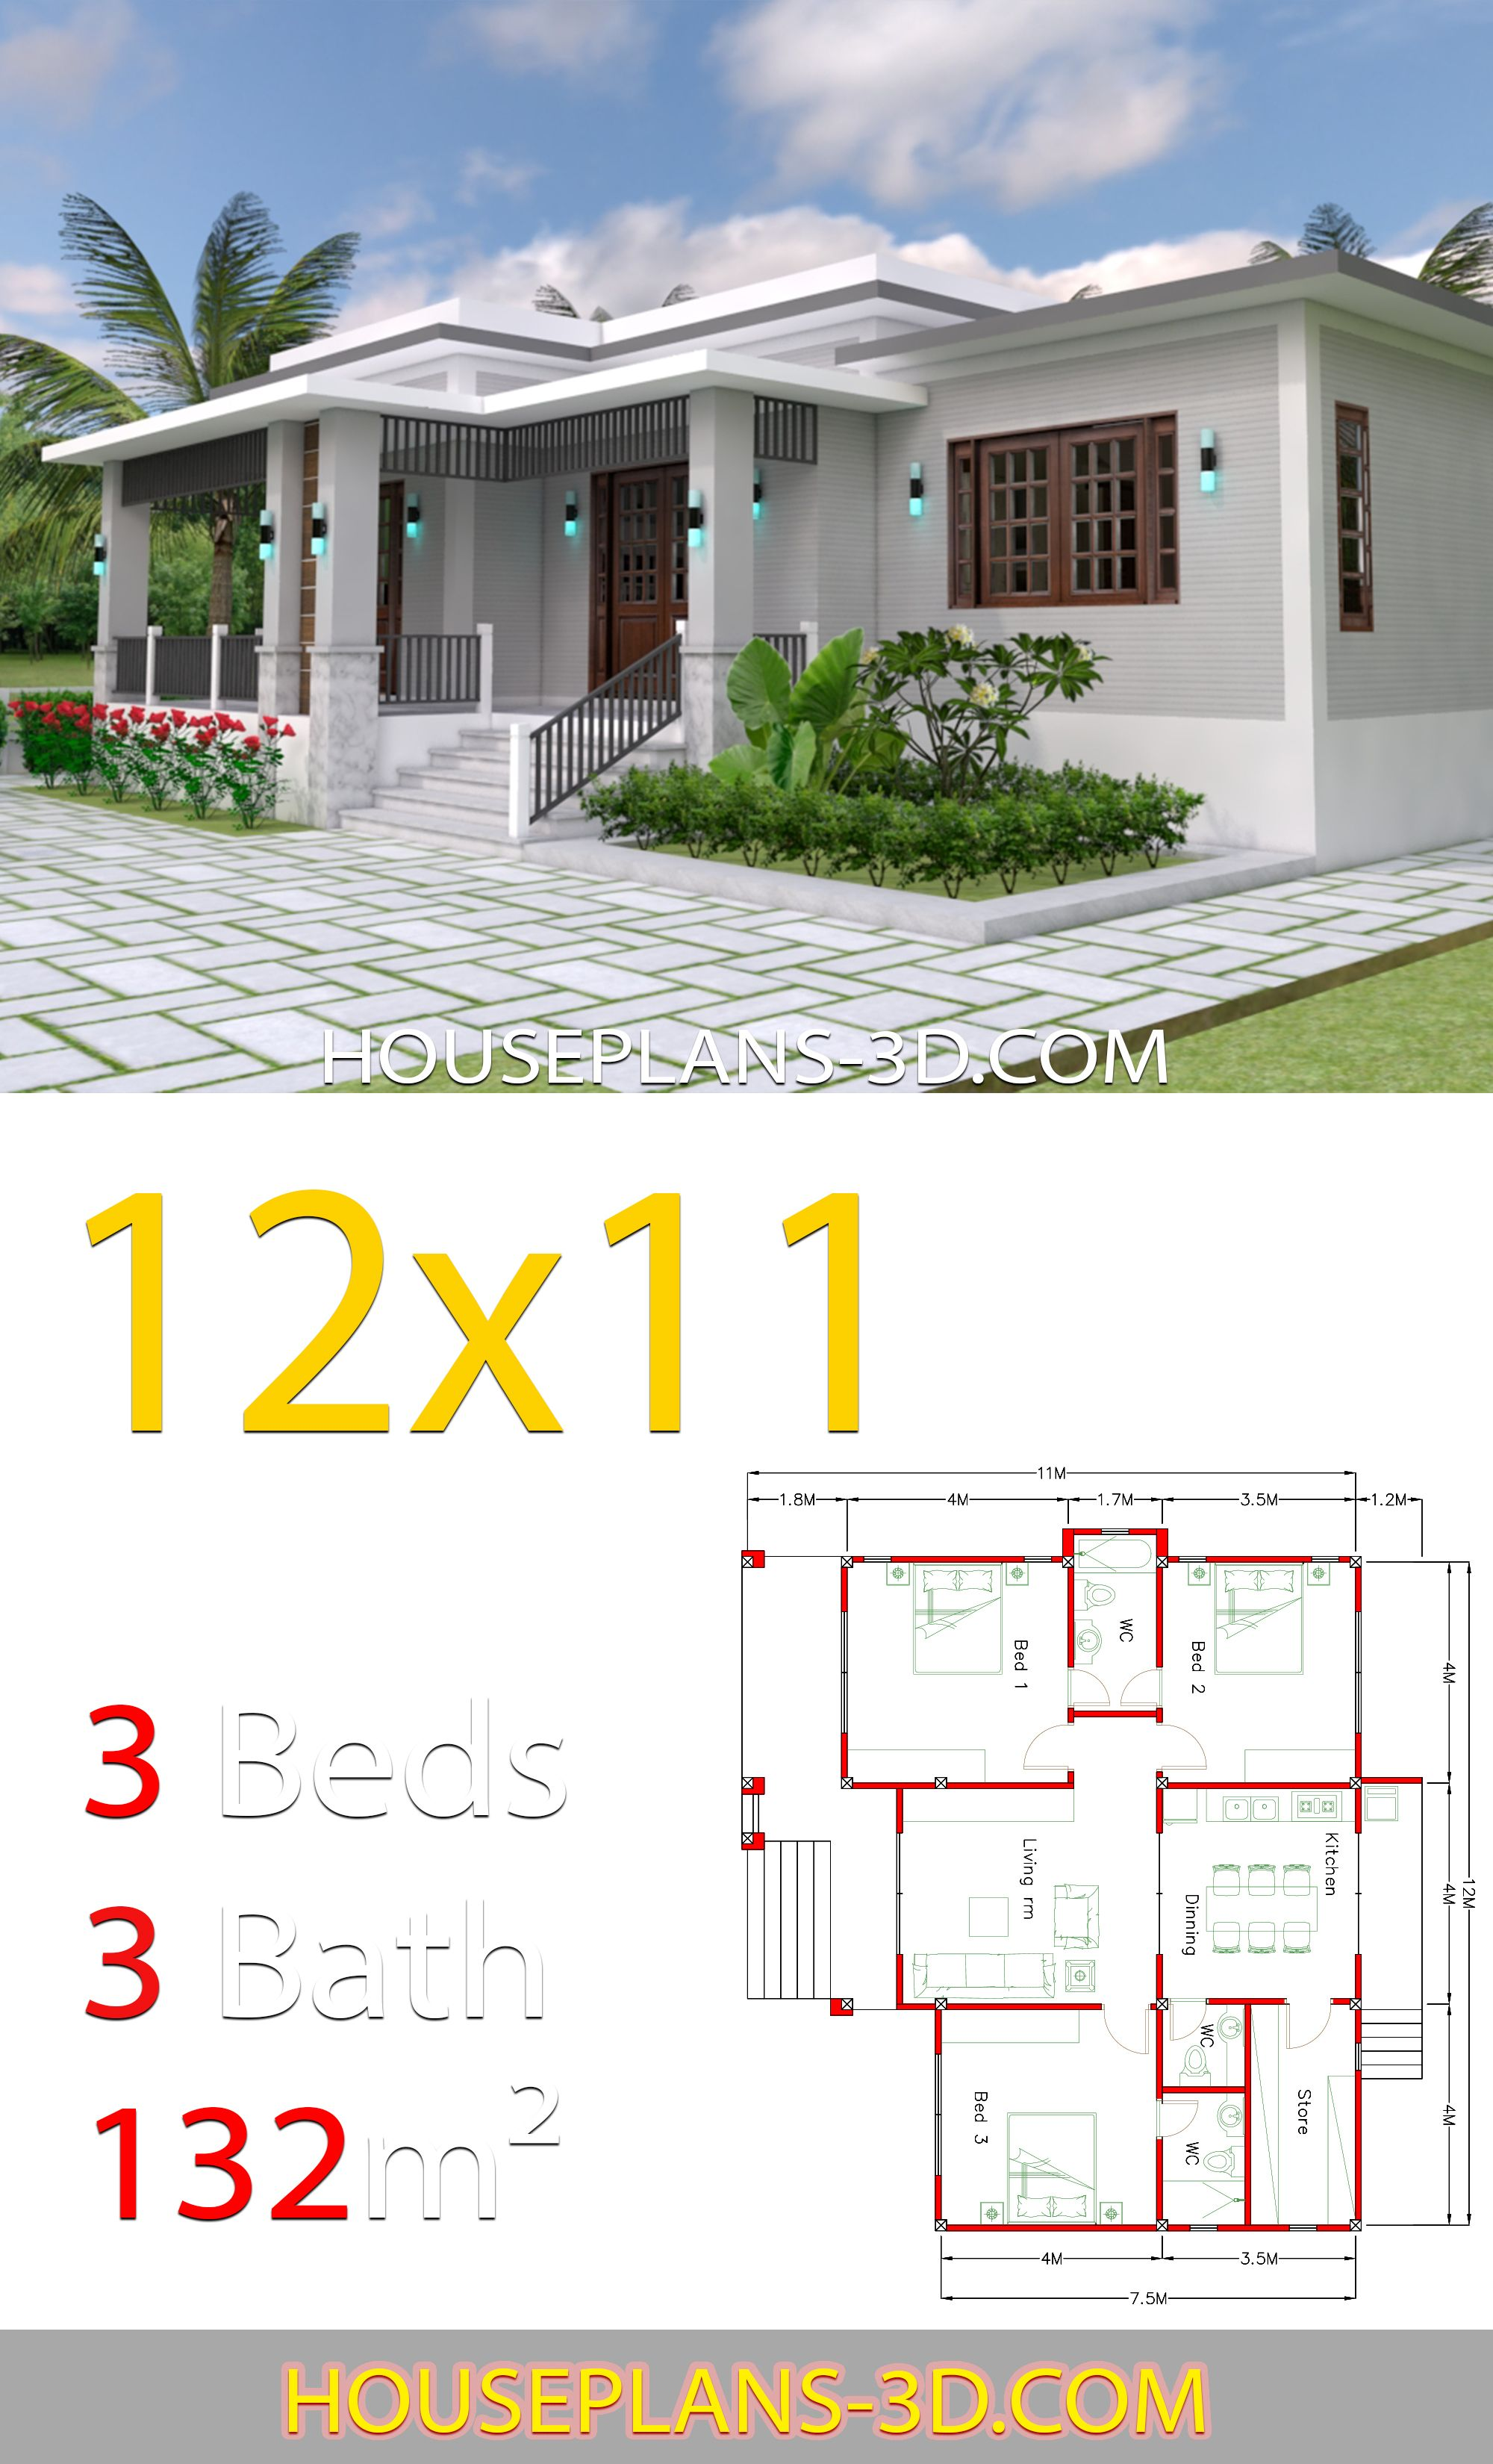 Home Design 12x11 With 3 Bedrooms Terrace Roof Maison Architecte